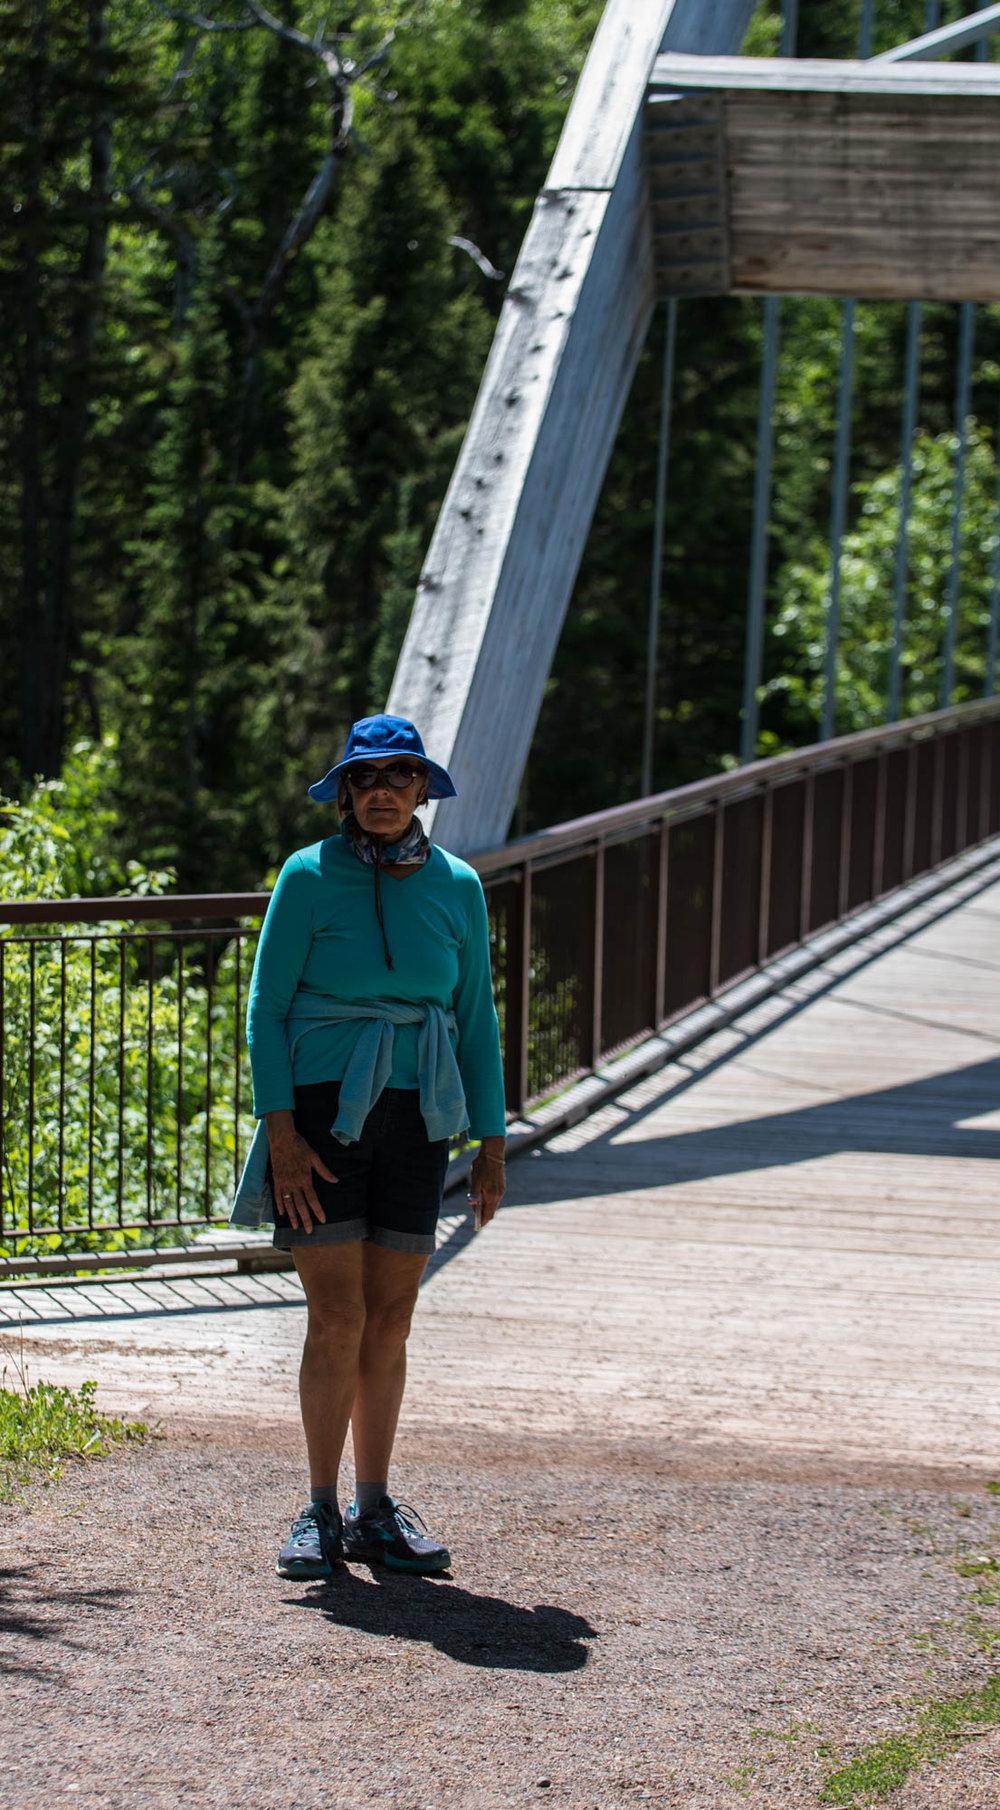 Nana crosses the bridge